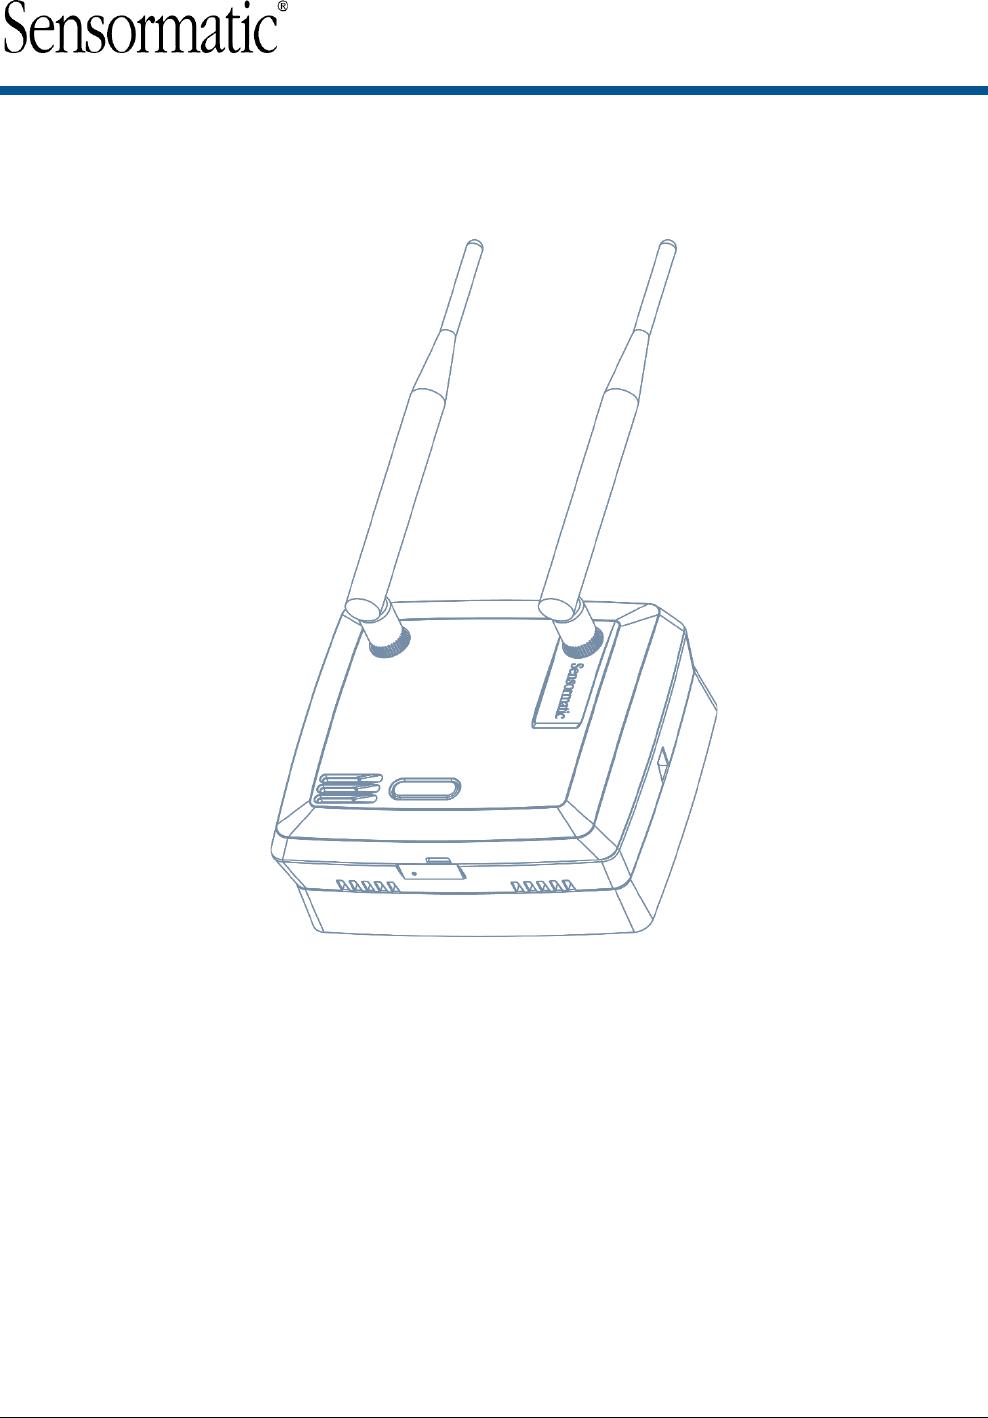 Tyco Safety Sensormatic BIM1000 Business Intelligence